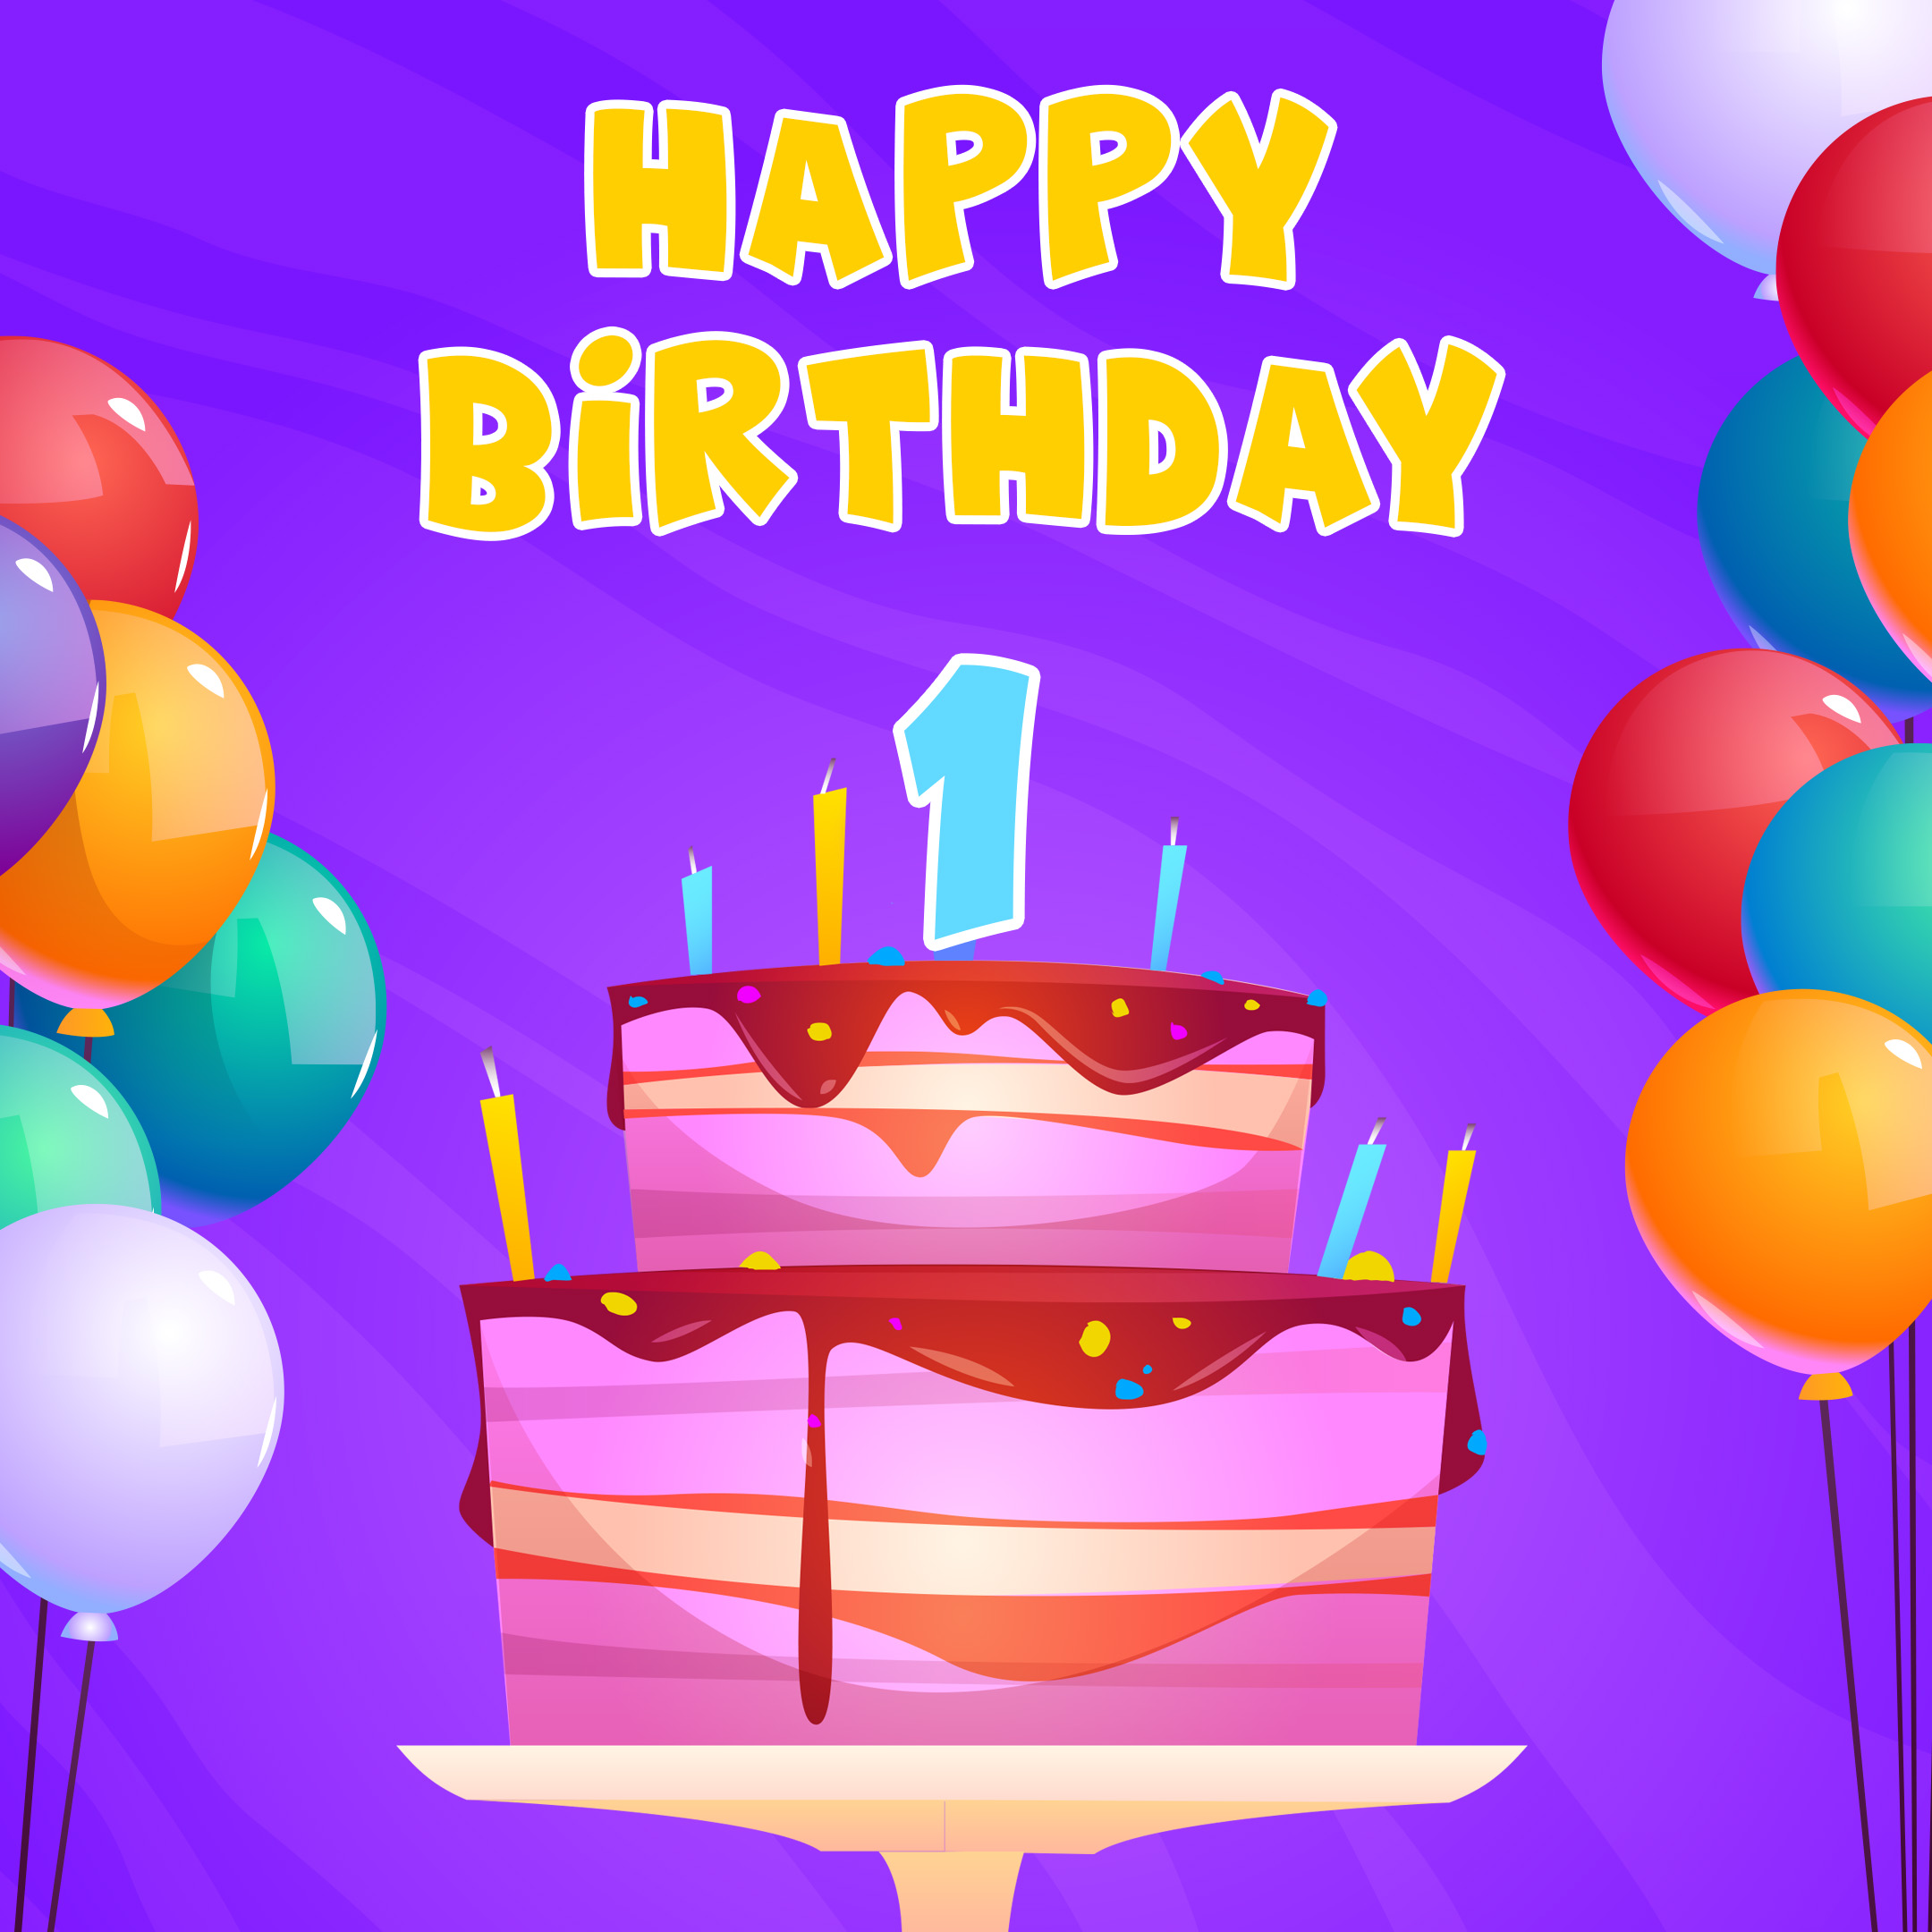 Free 1st Year Happy Birthday Image With Cake And Balloons - birthdayimg.com